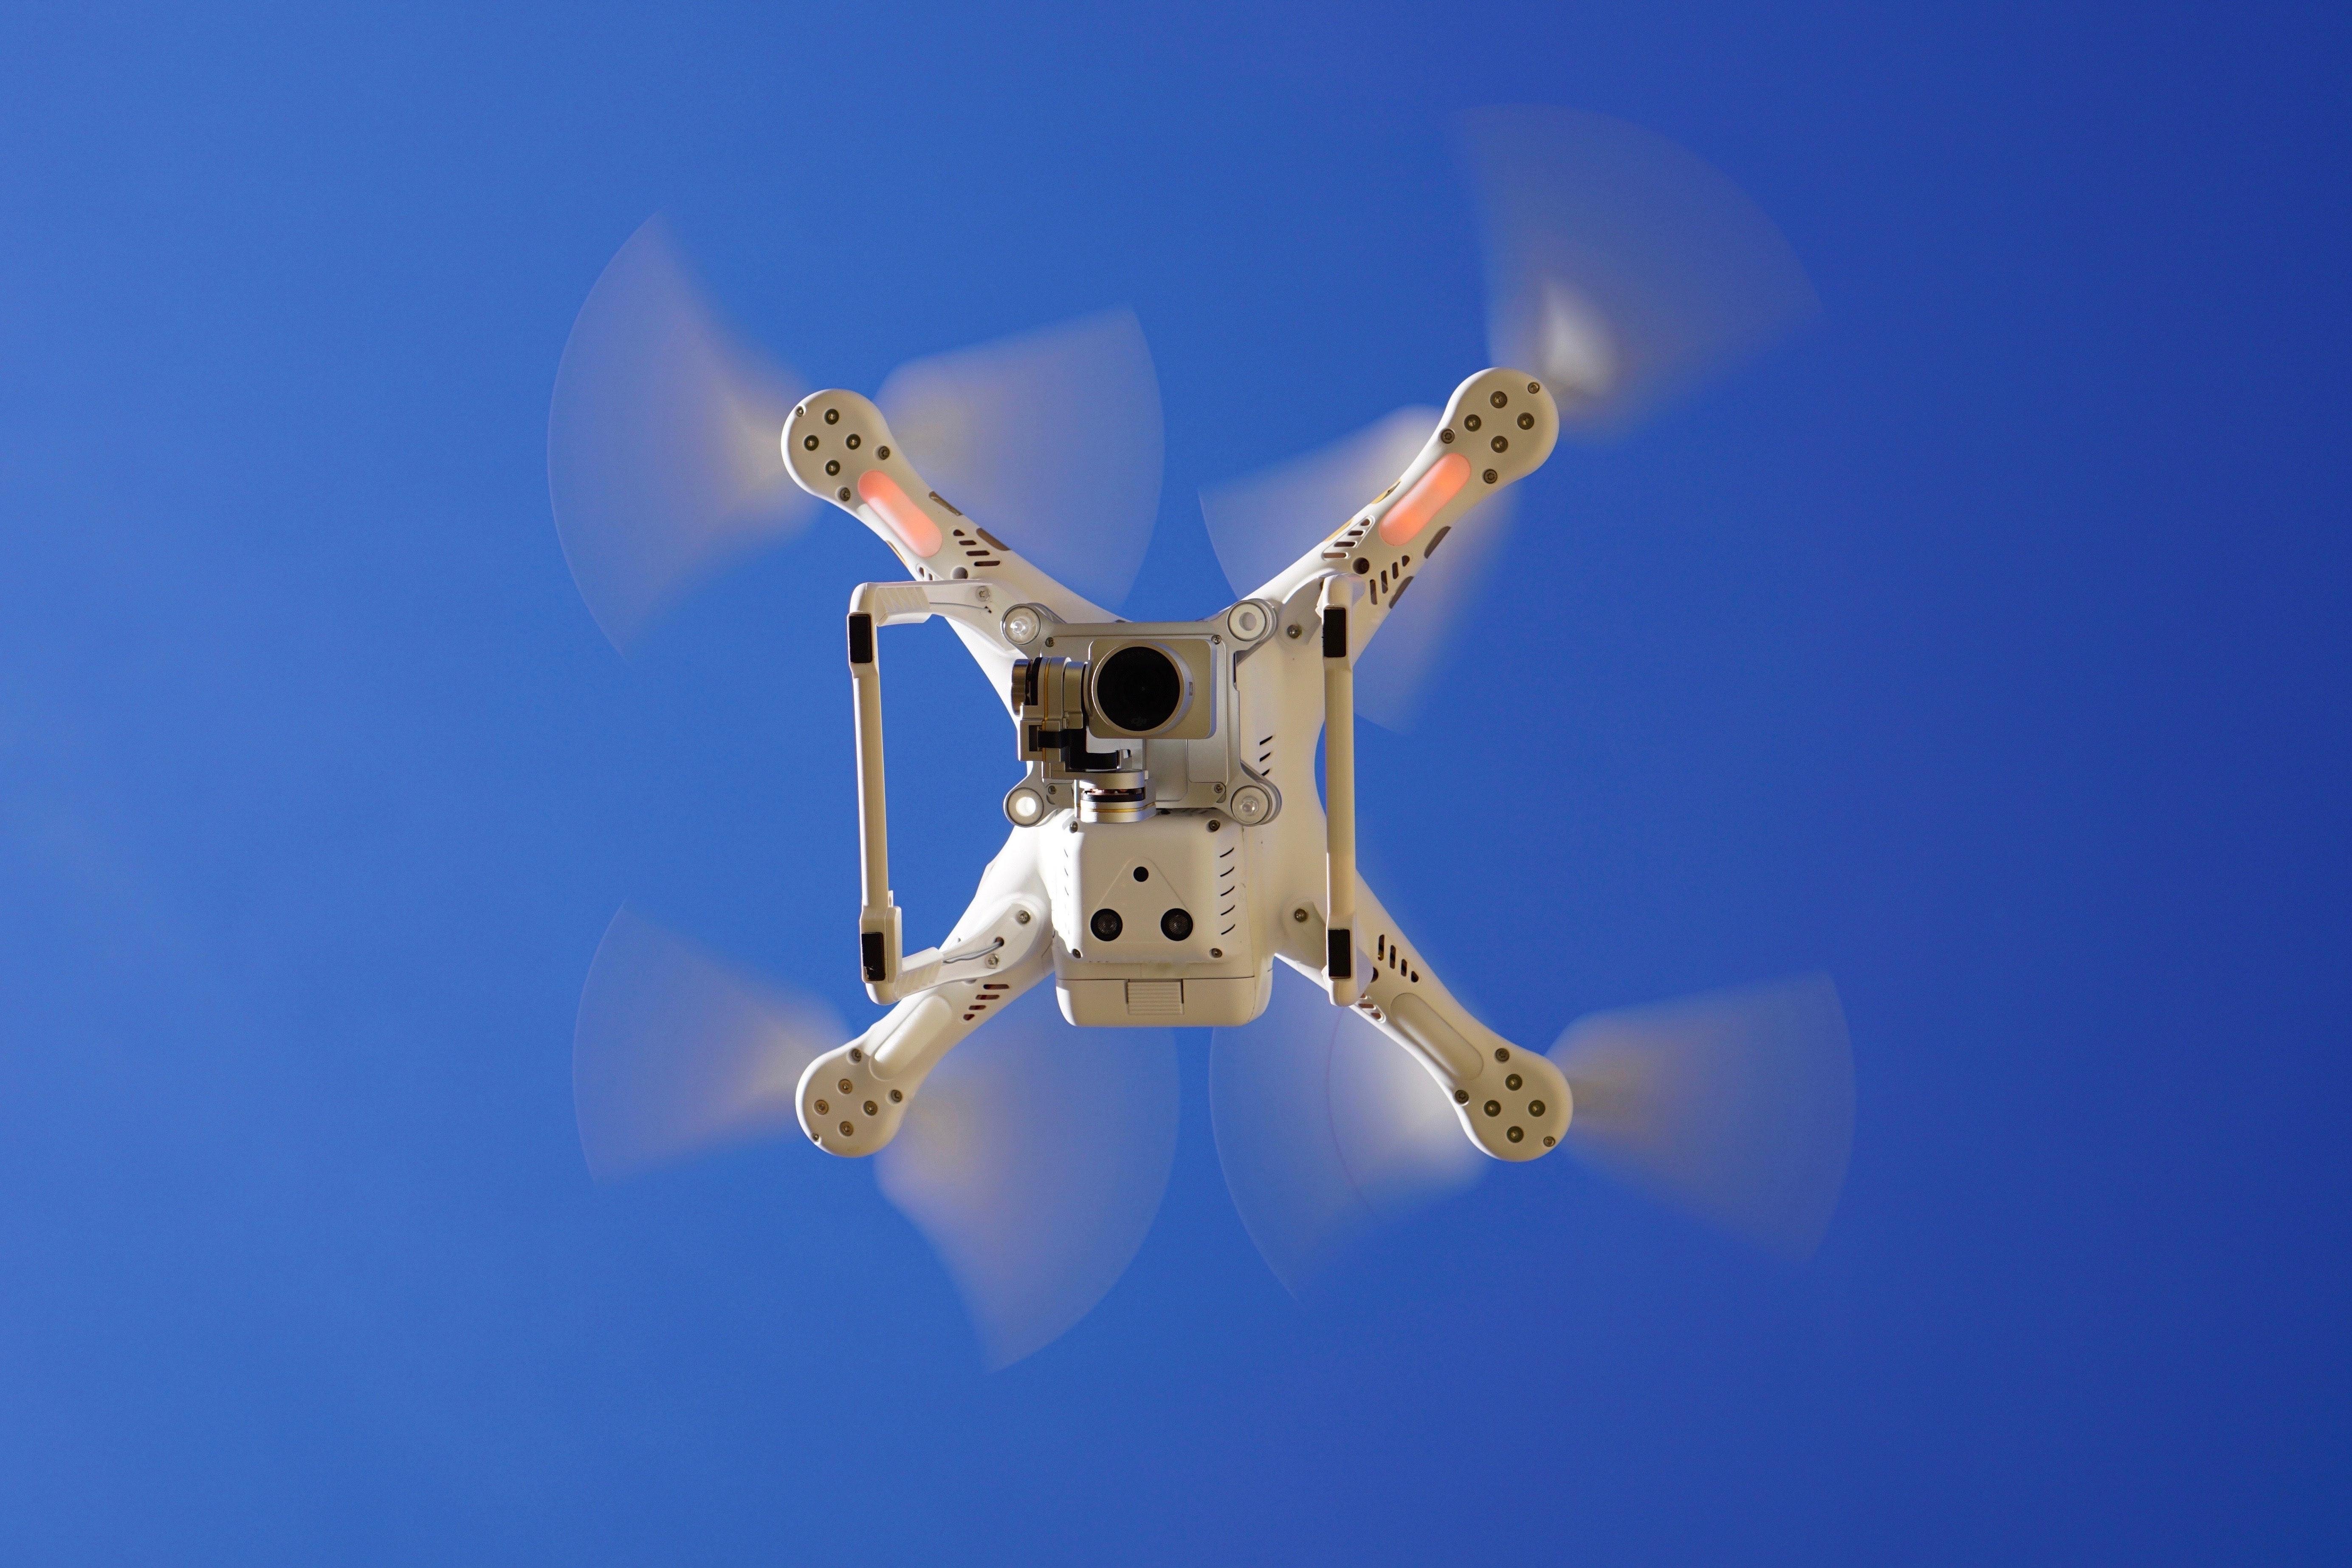 traffic drones